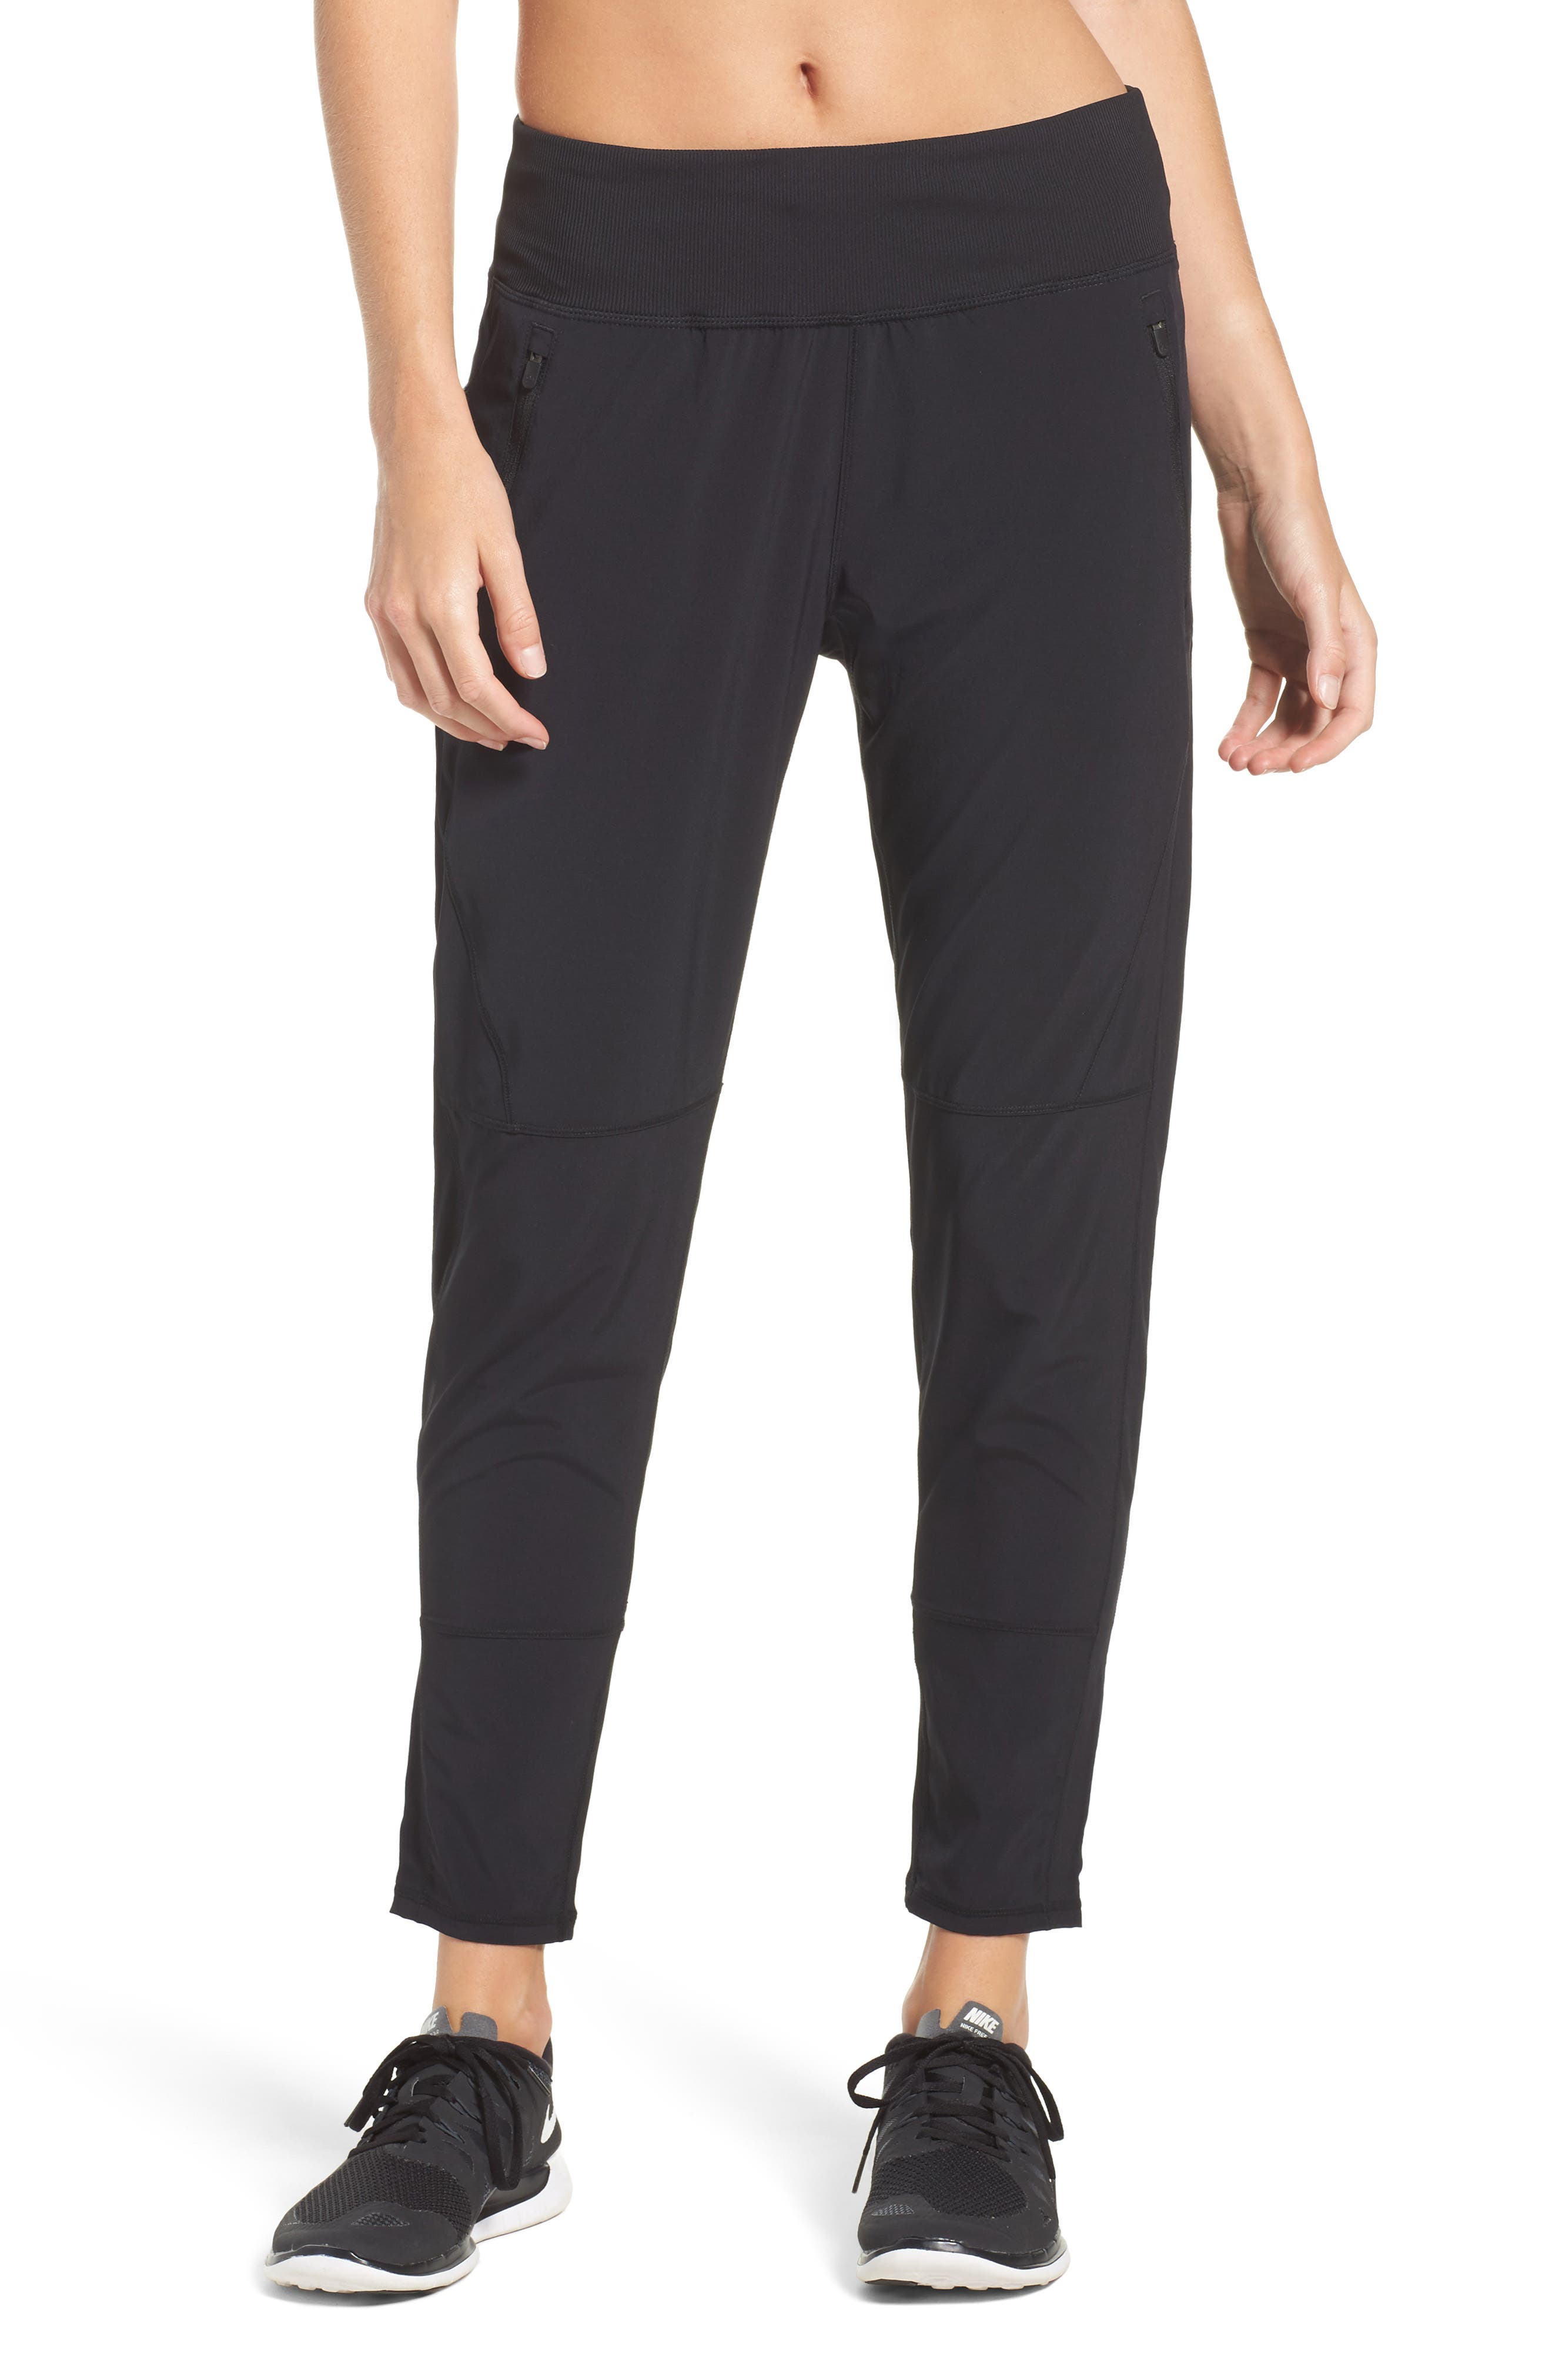 Transition Ankle Pants,                         Main,                         color, 001